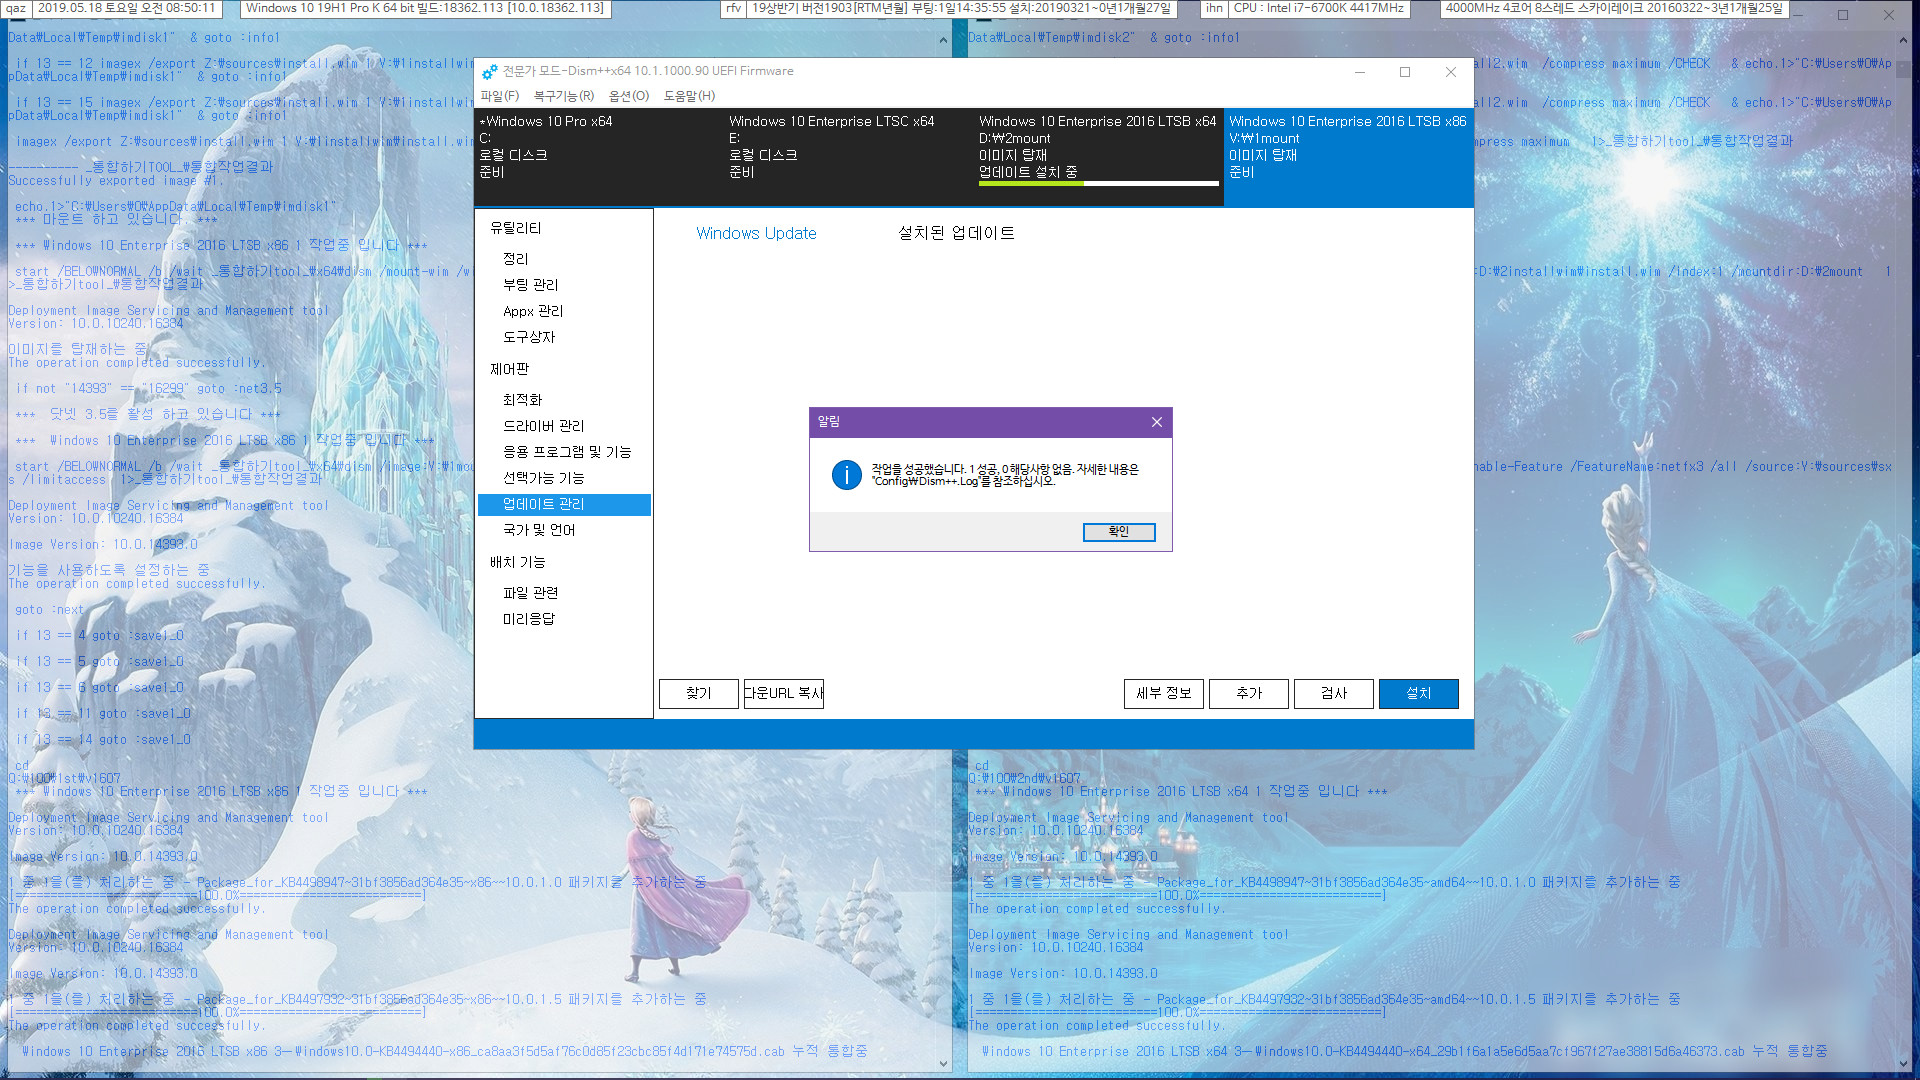 Windows 10 버전 1607용 누적 업데이트 KB4494440 (OS 빌드 14393.2969) [2019-05-14 일자] - 2016 LTSB만 통합중입니다 - 32비트 64비트 겸용 뼈대 [최초기록] 2019-05-18_085011.jpg